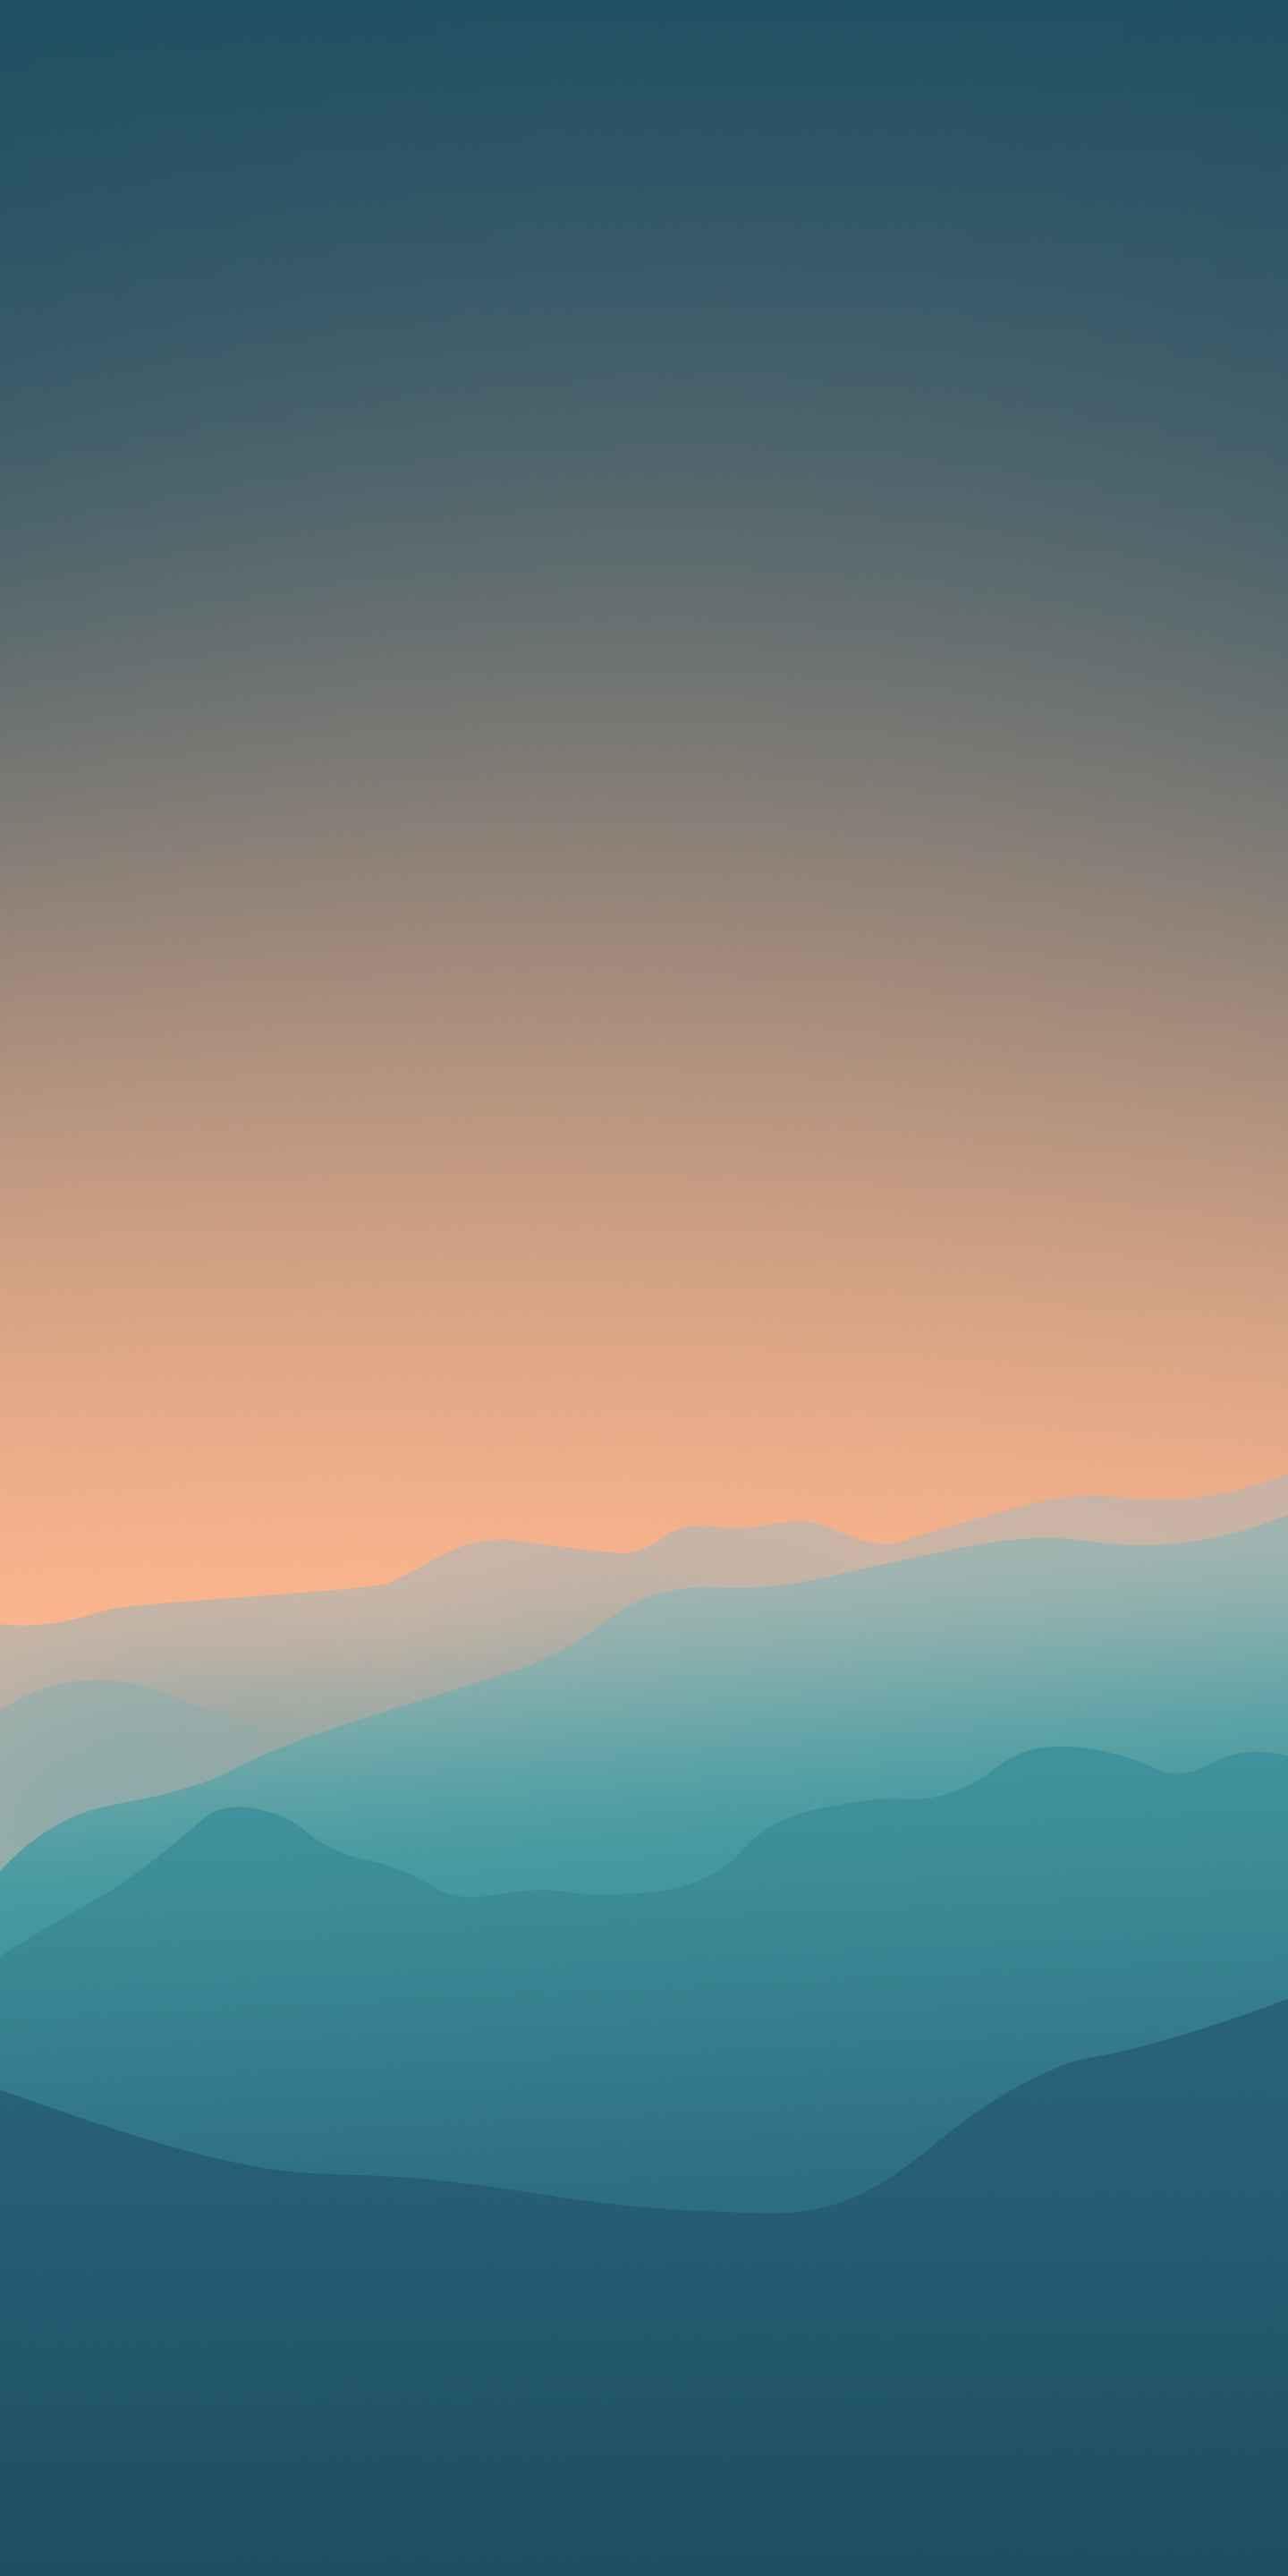 Evening Horizon Minimal iPhone Wallpaper